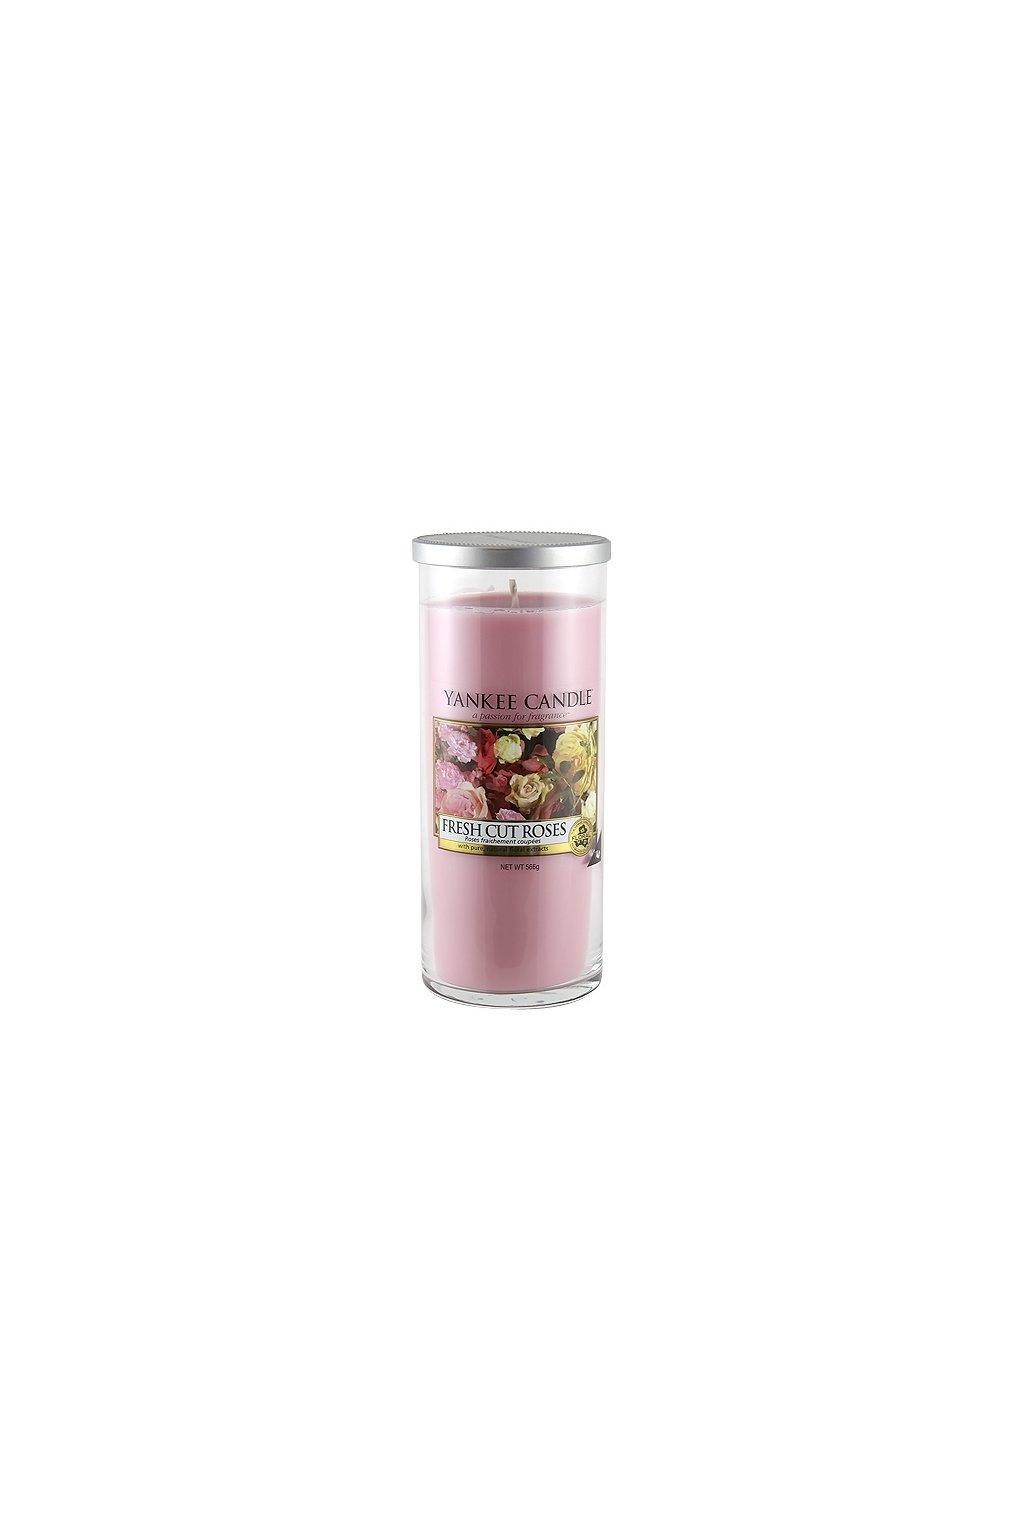 Svíčka ve skleněném válci Yankee Candle - Fresh Cut Roses 566g